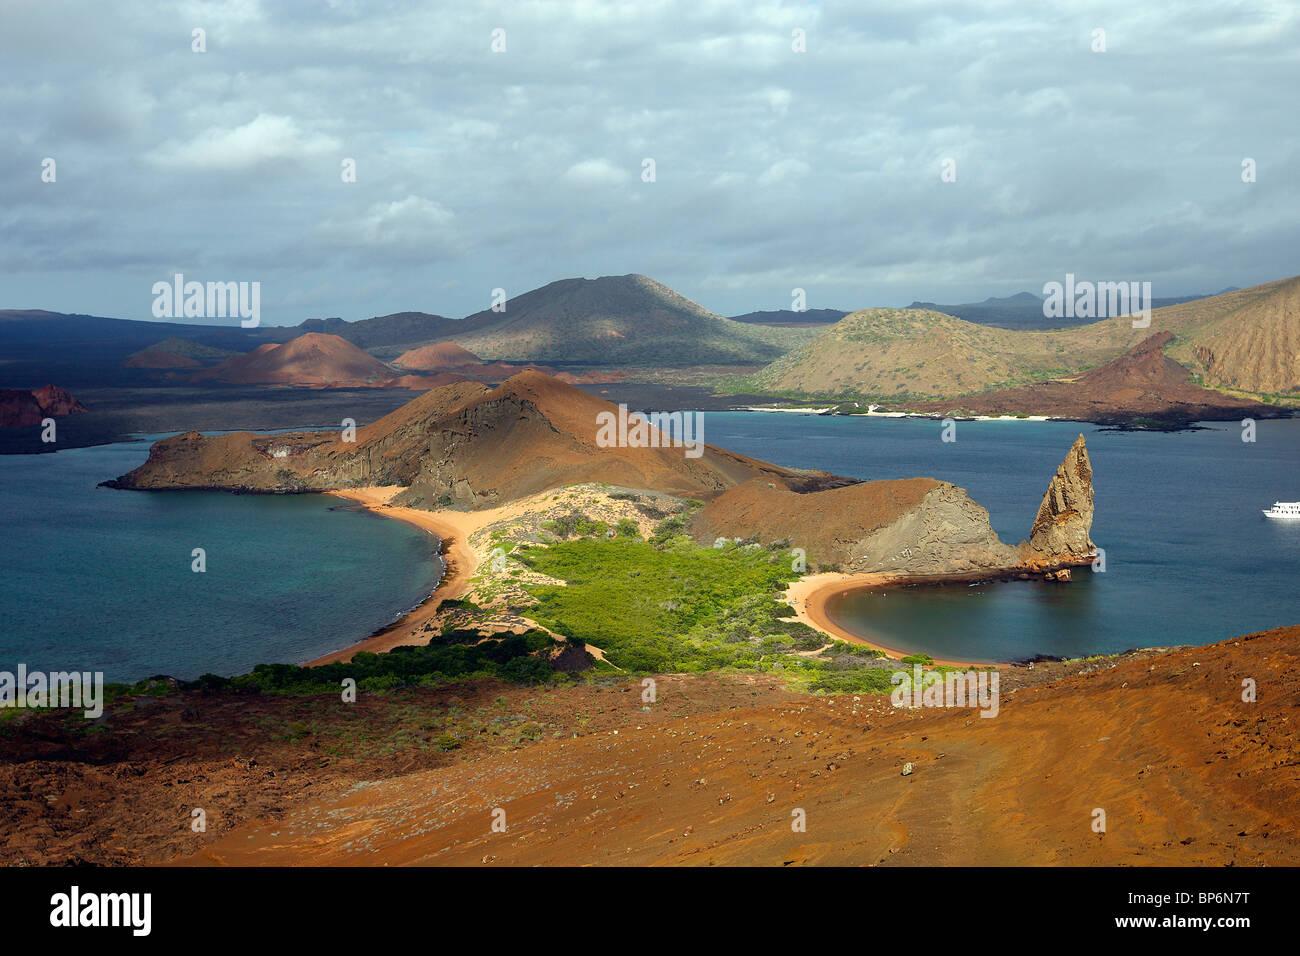 View of Bartolome Island with Pinnacle Rock, Galapagos. - Stock Image